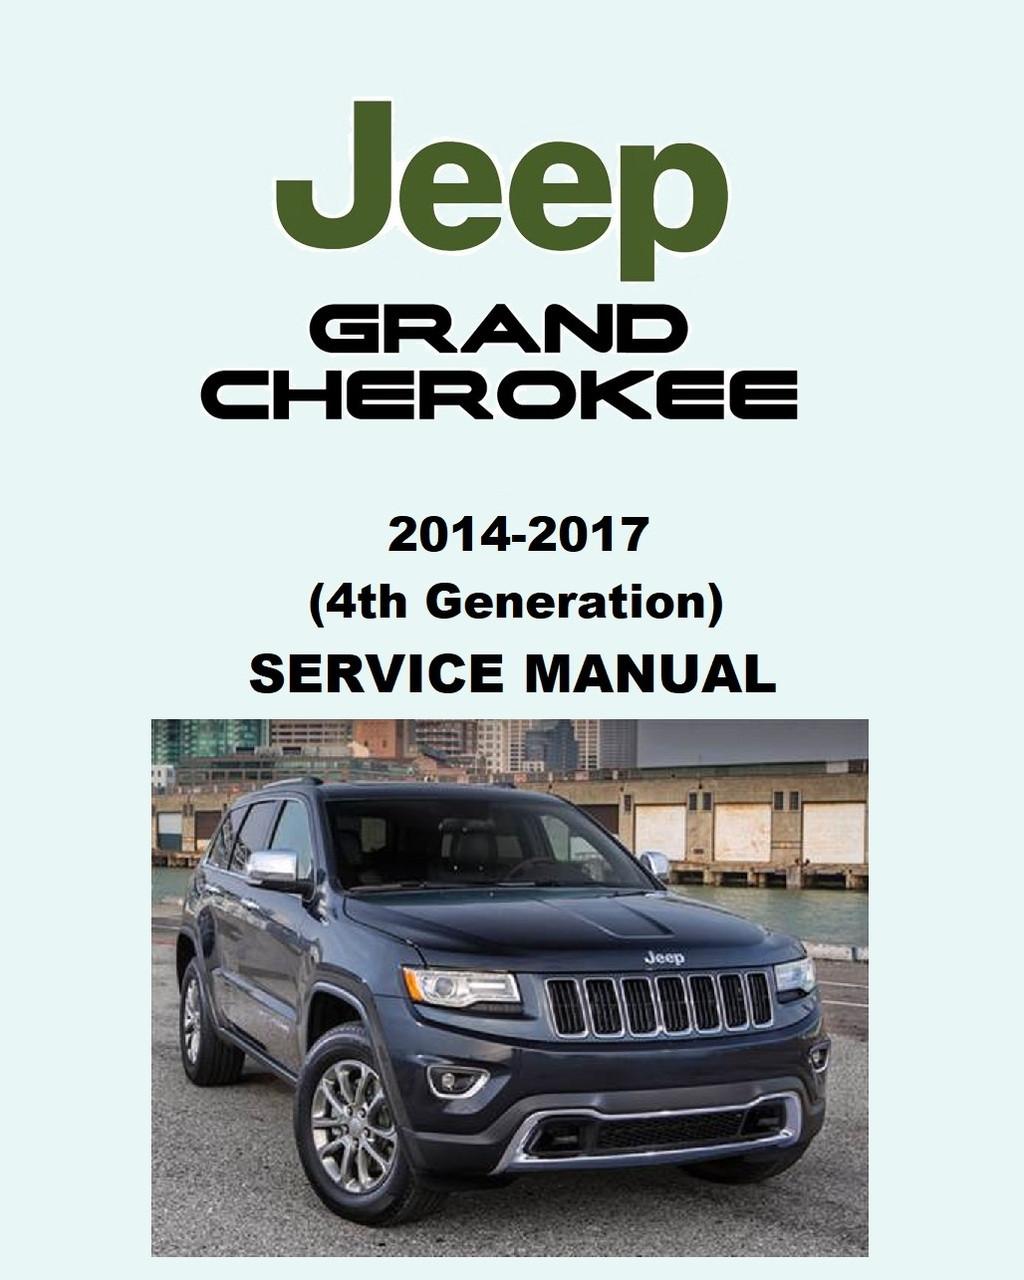 Jeep Grand Cherokee Parts Catalog Pdf : grand, cherokee, parts, catalog, Grand, Cherokee, Service, Manual